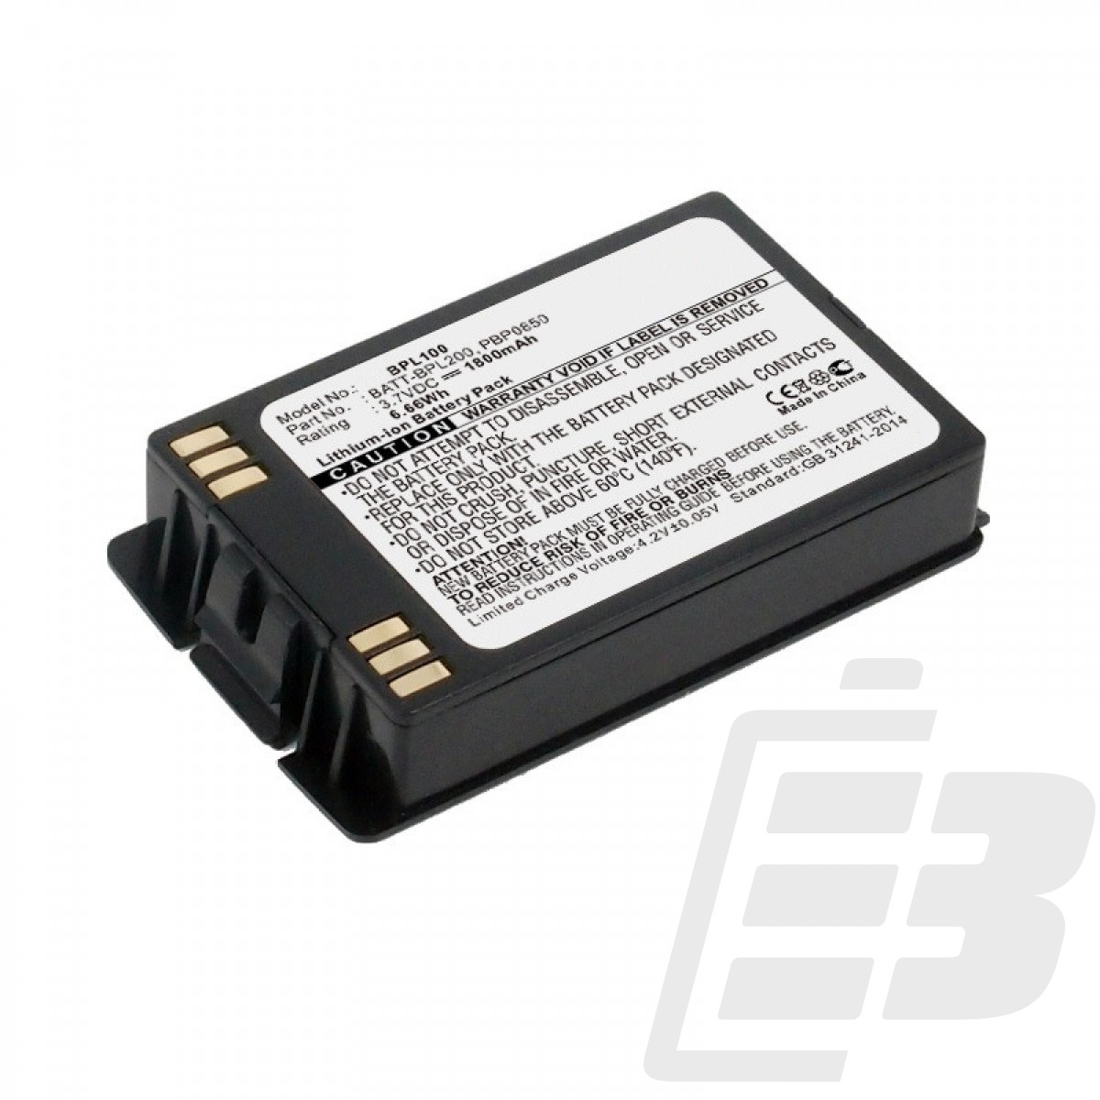 Cordless phone battery Avaya 3645_1